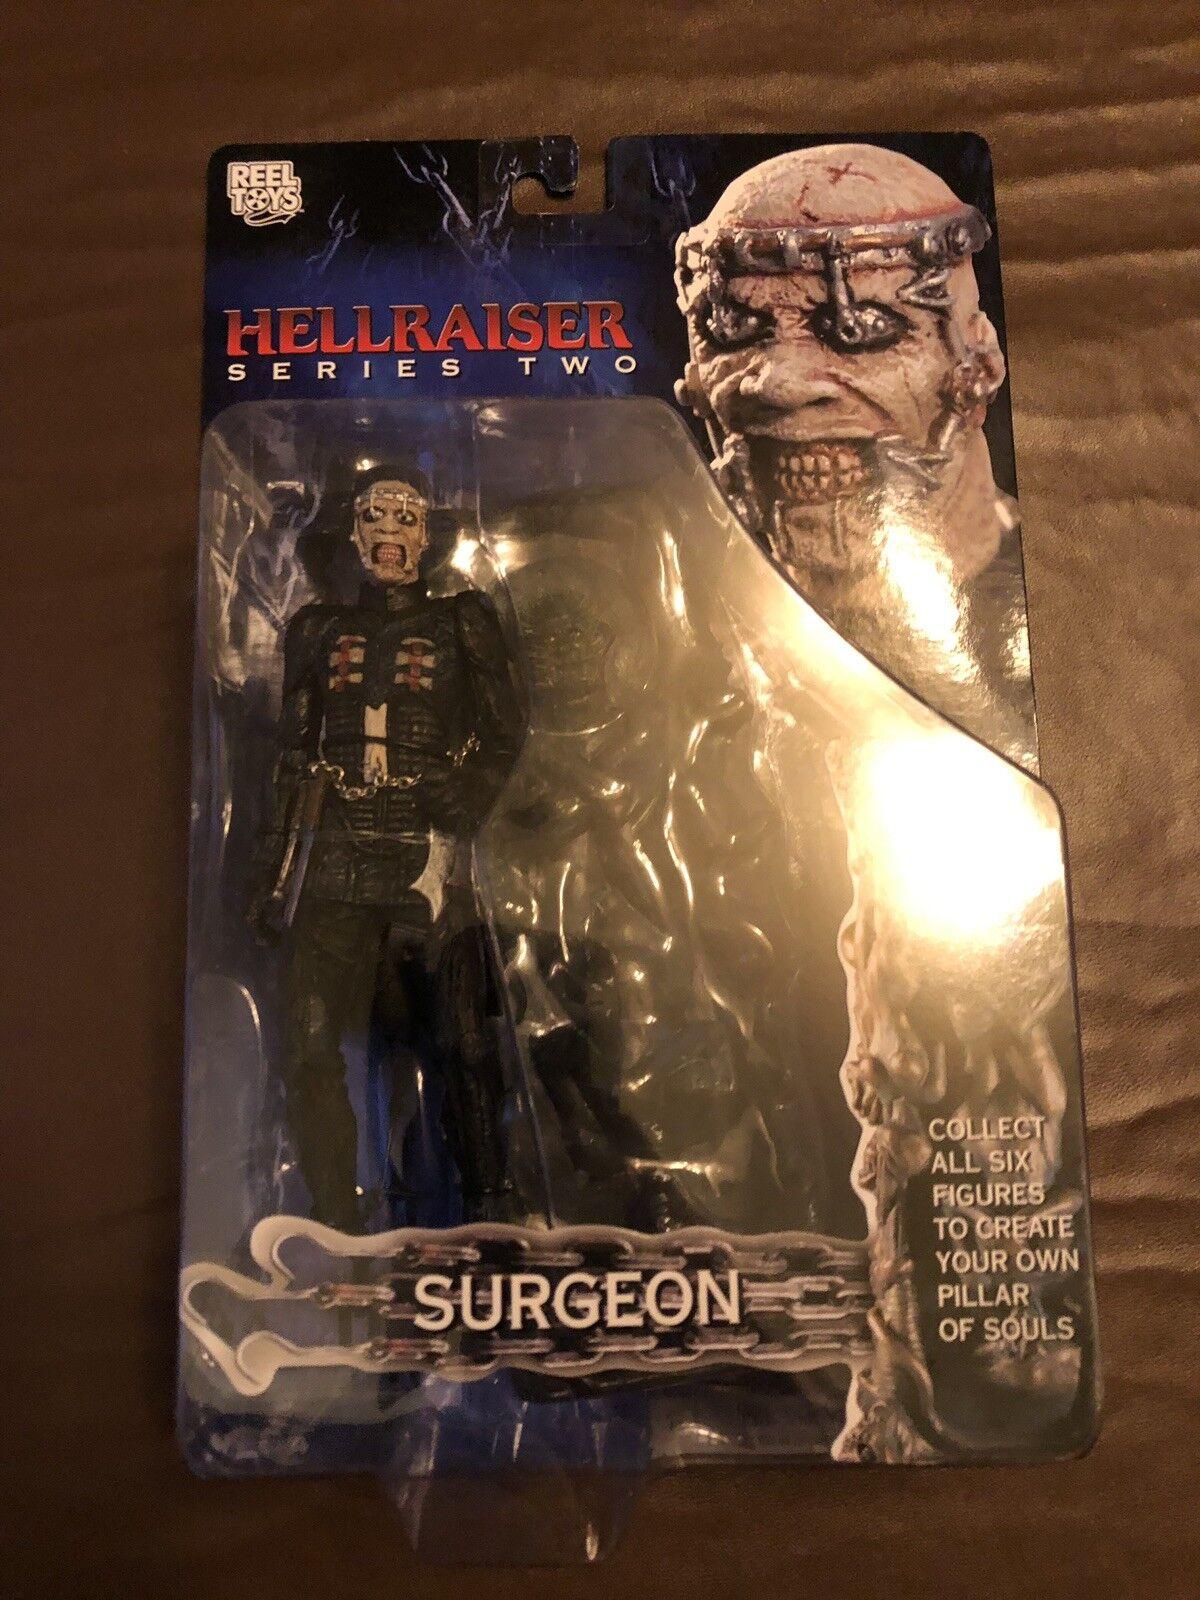 NECA Hellraiser Serie 2 cirujano afhrs 2 38